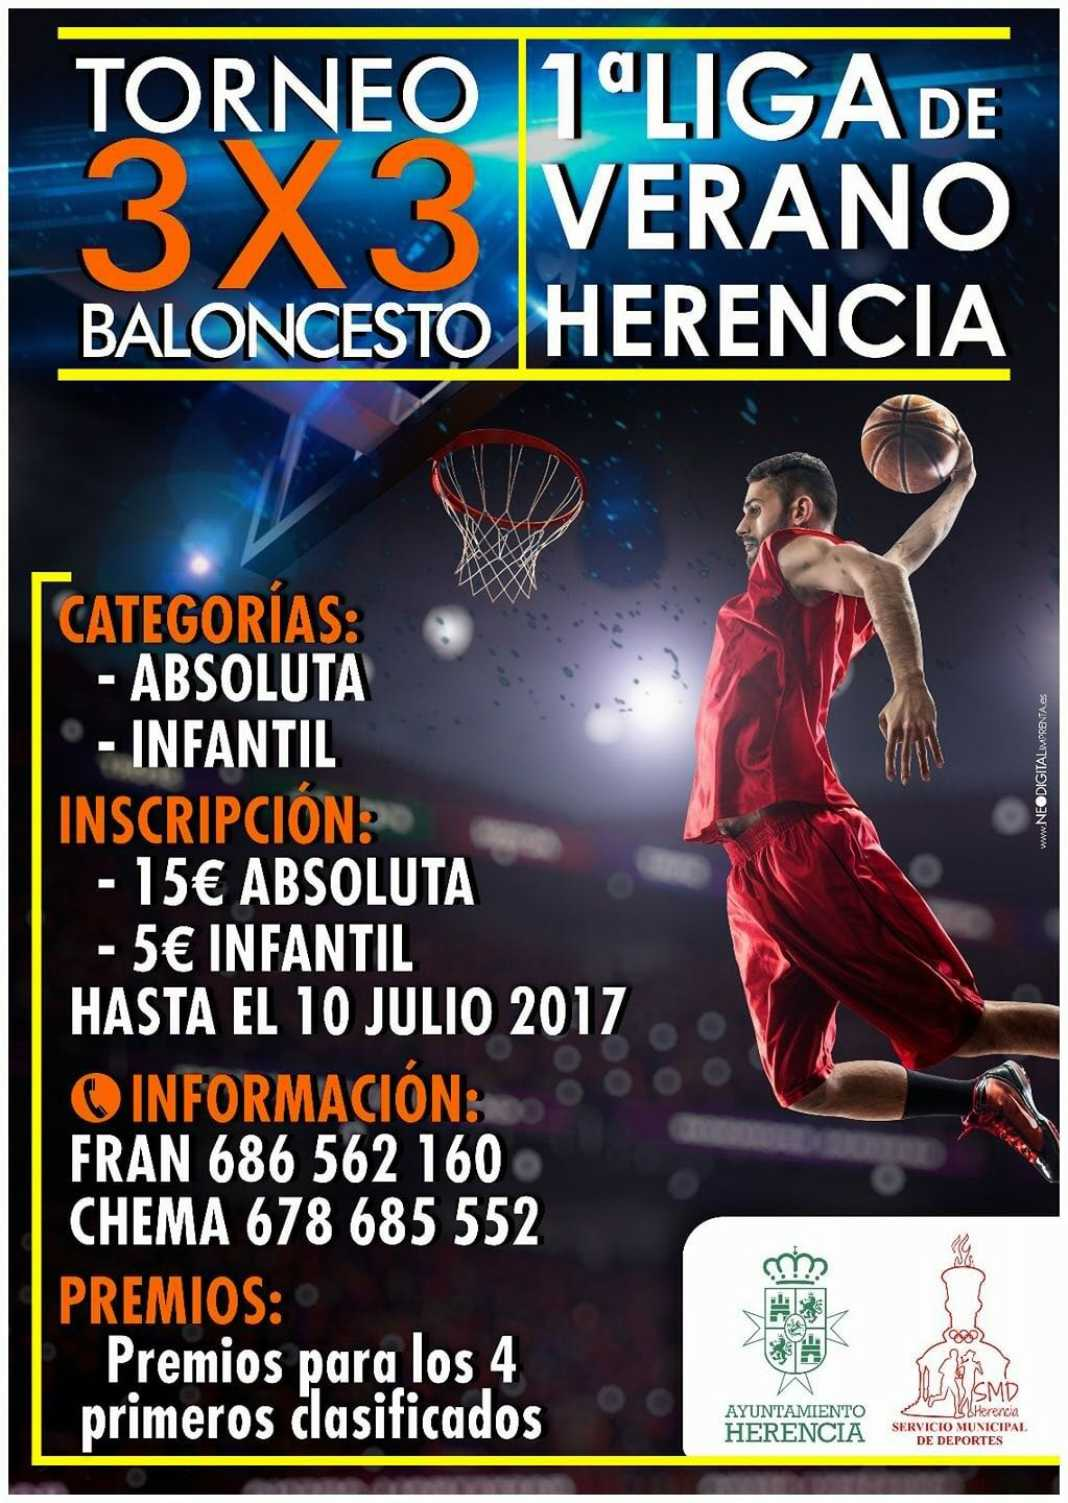 baloncesto 3x3 2017 herencia 1068x1503 - Torneo 3×3 de Baloncesto de Verano 2017